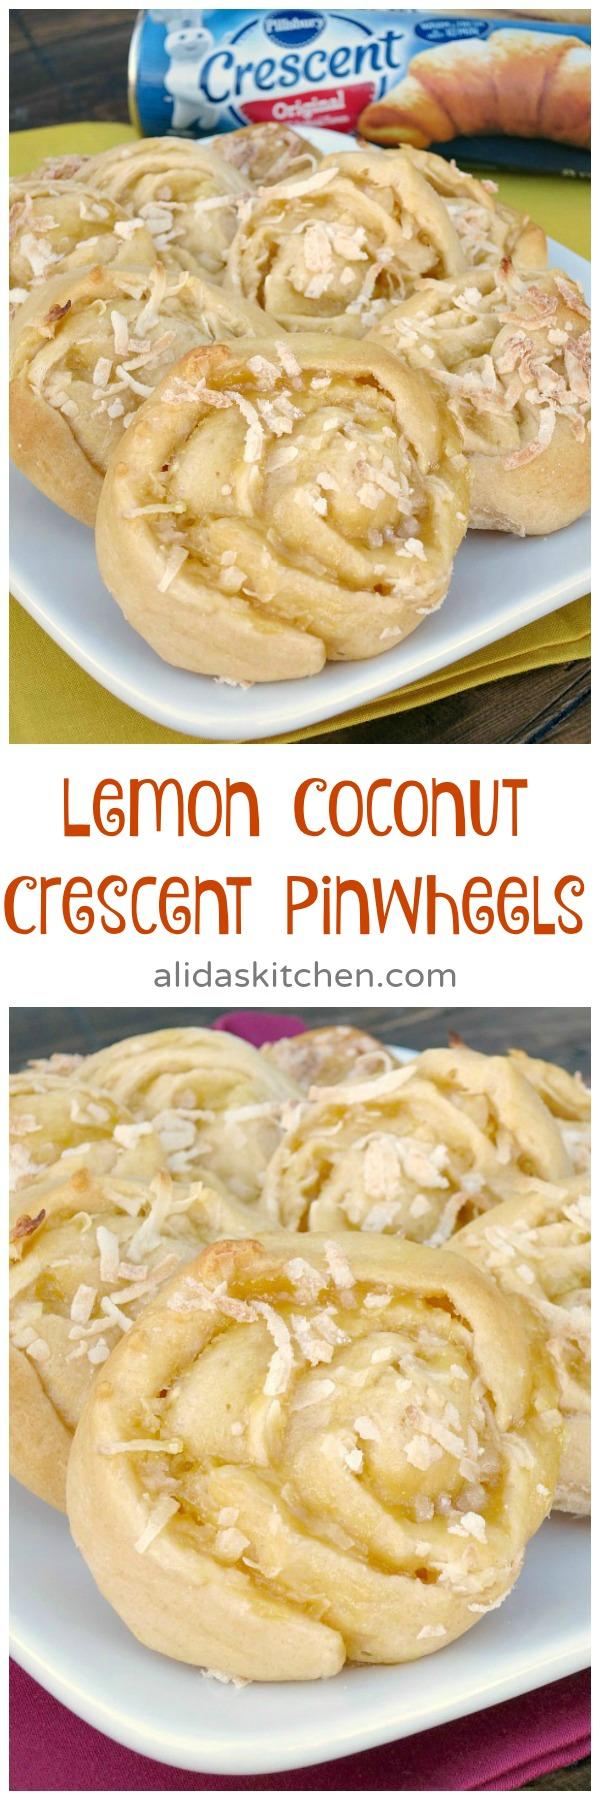 Lemon Coconut Crescent Pinwheels | alidaskitchen.com